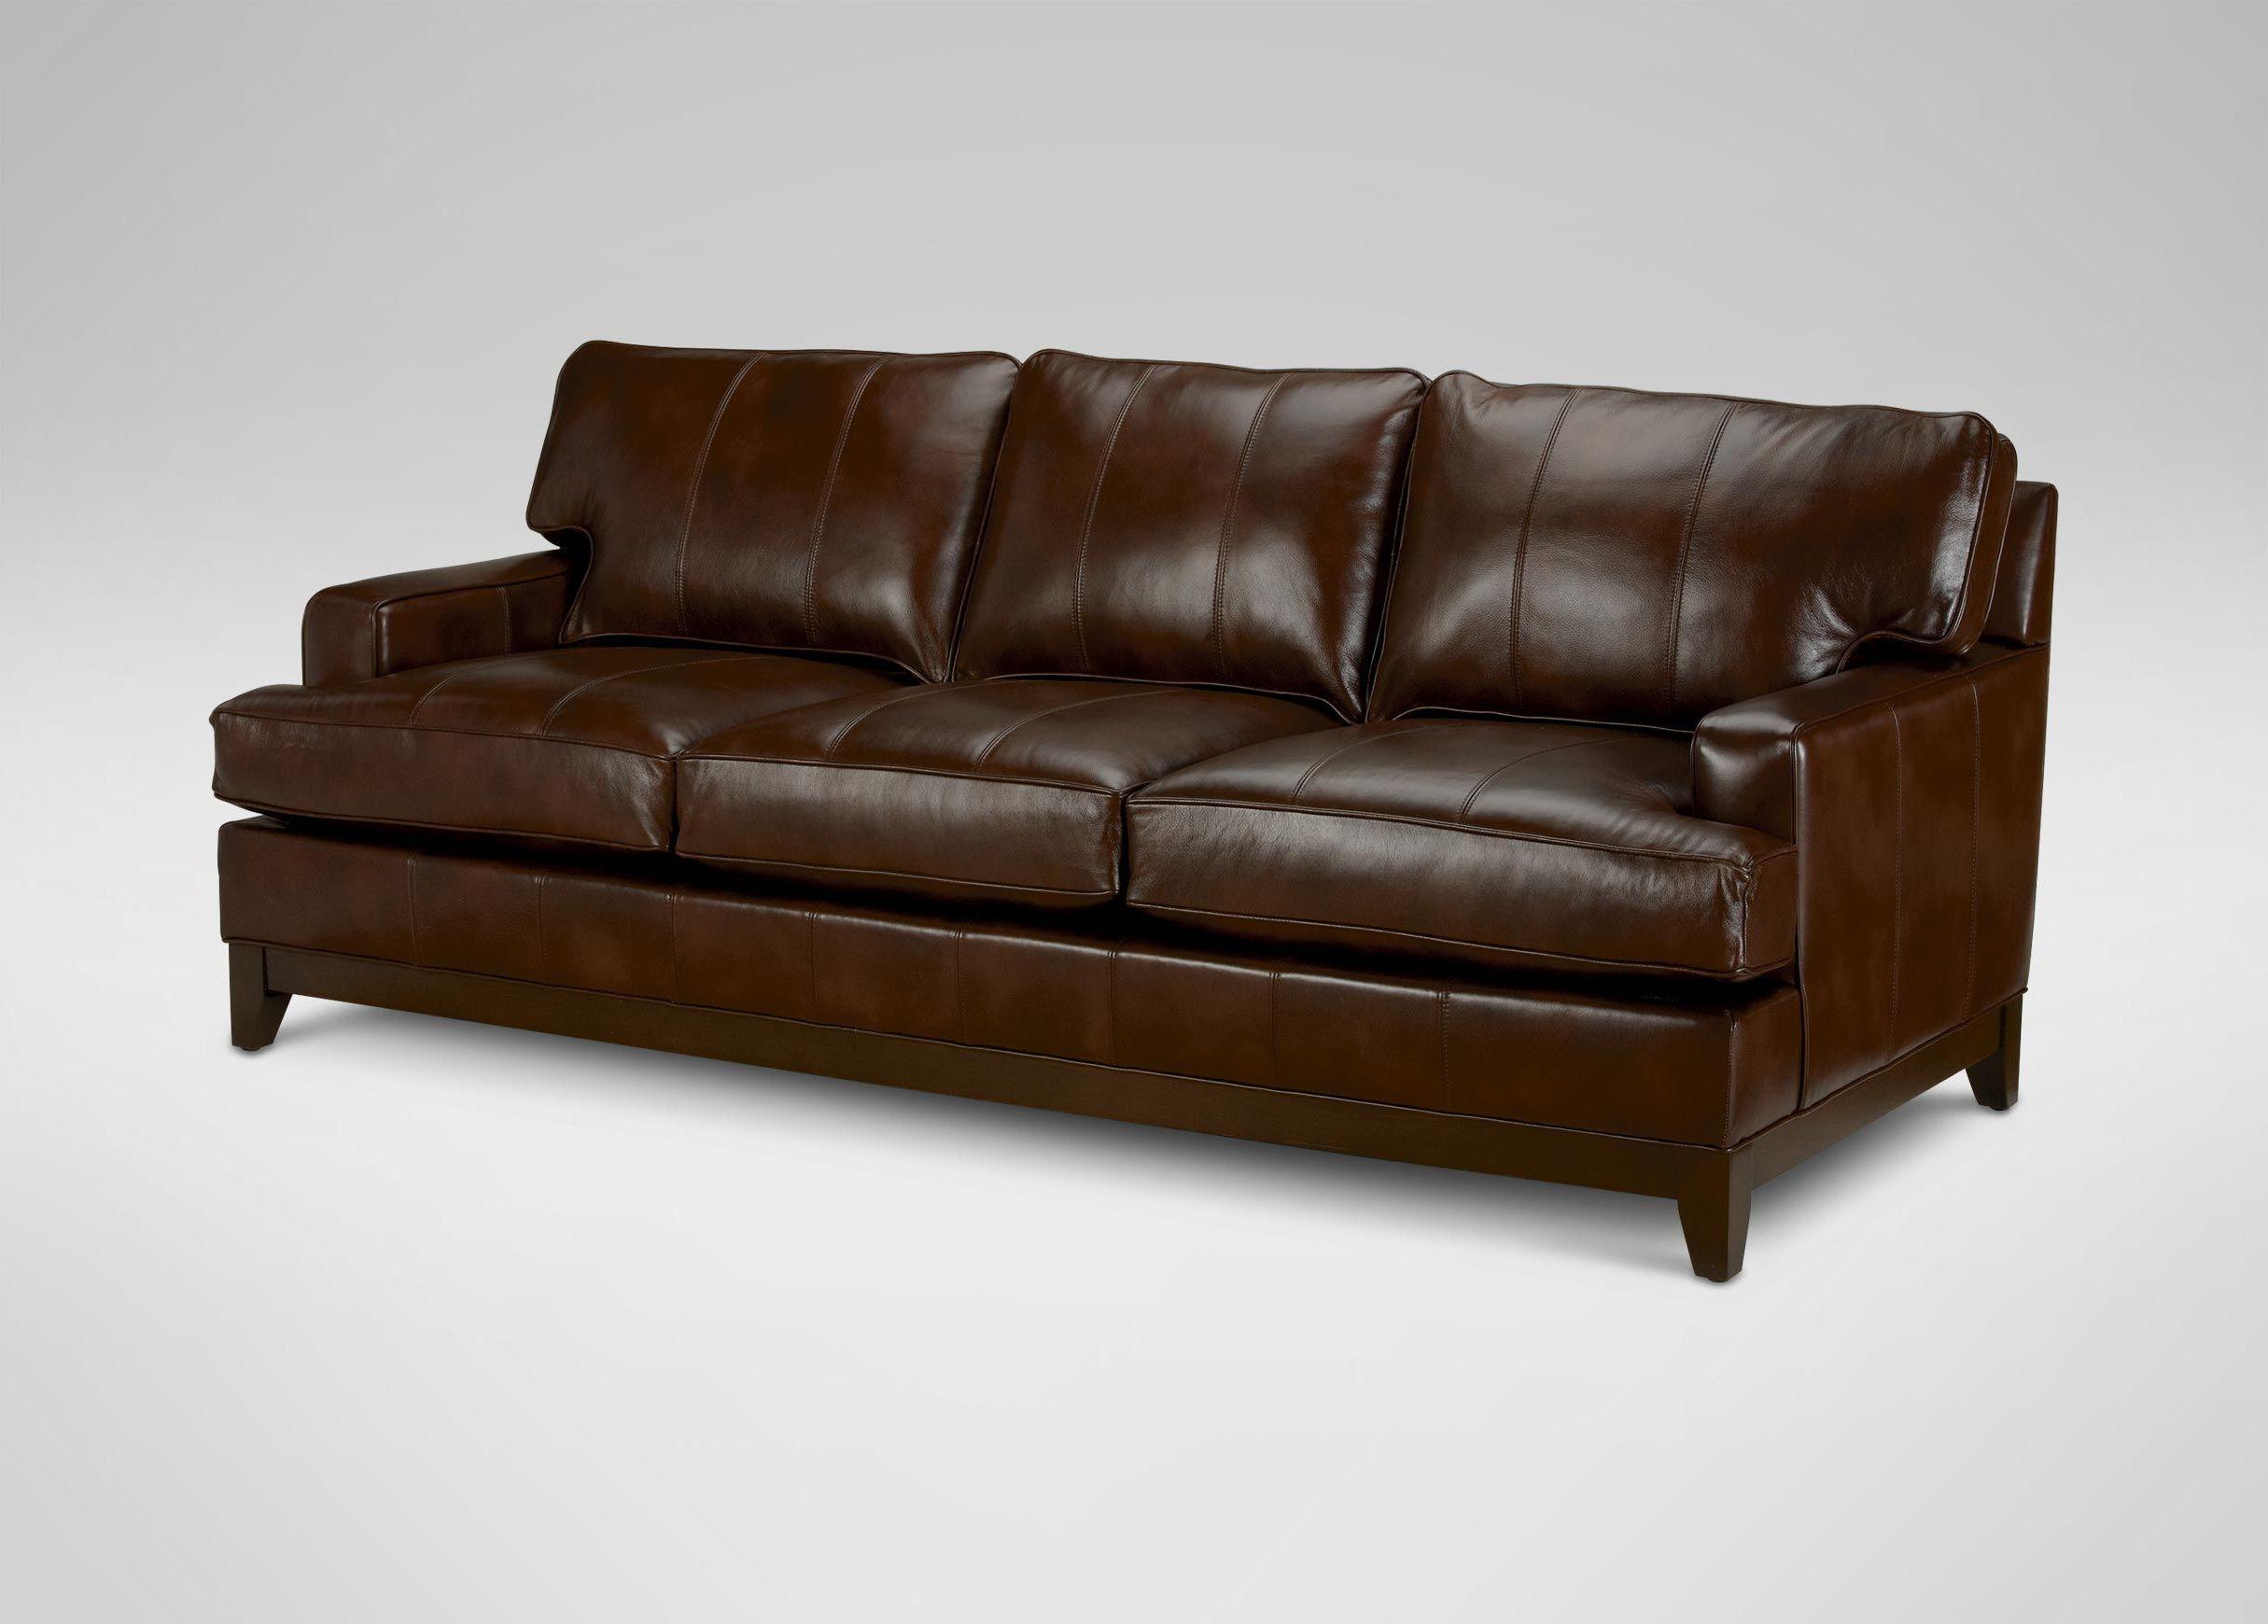 Ethan Allen Rugs | Overstuffed Couch | Ethan Allen Recliners